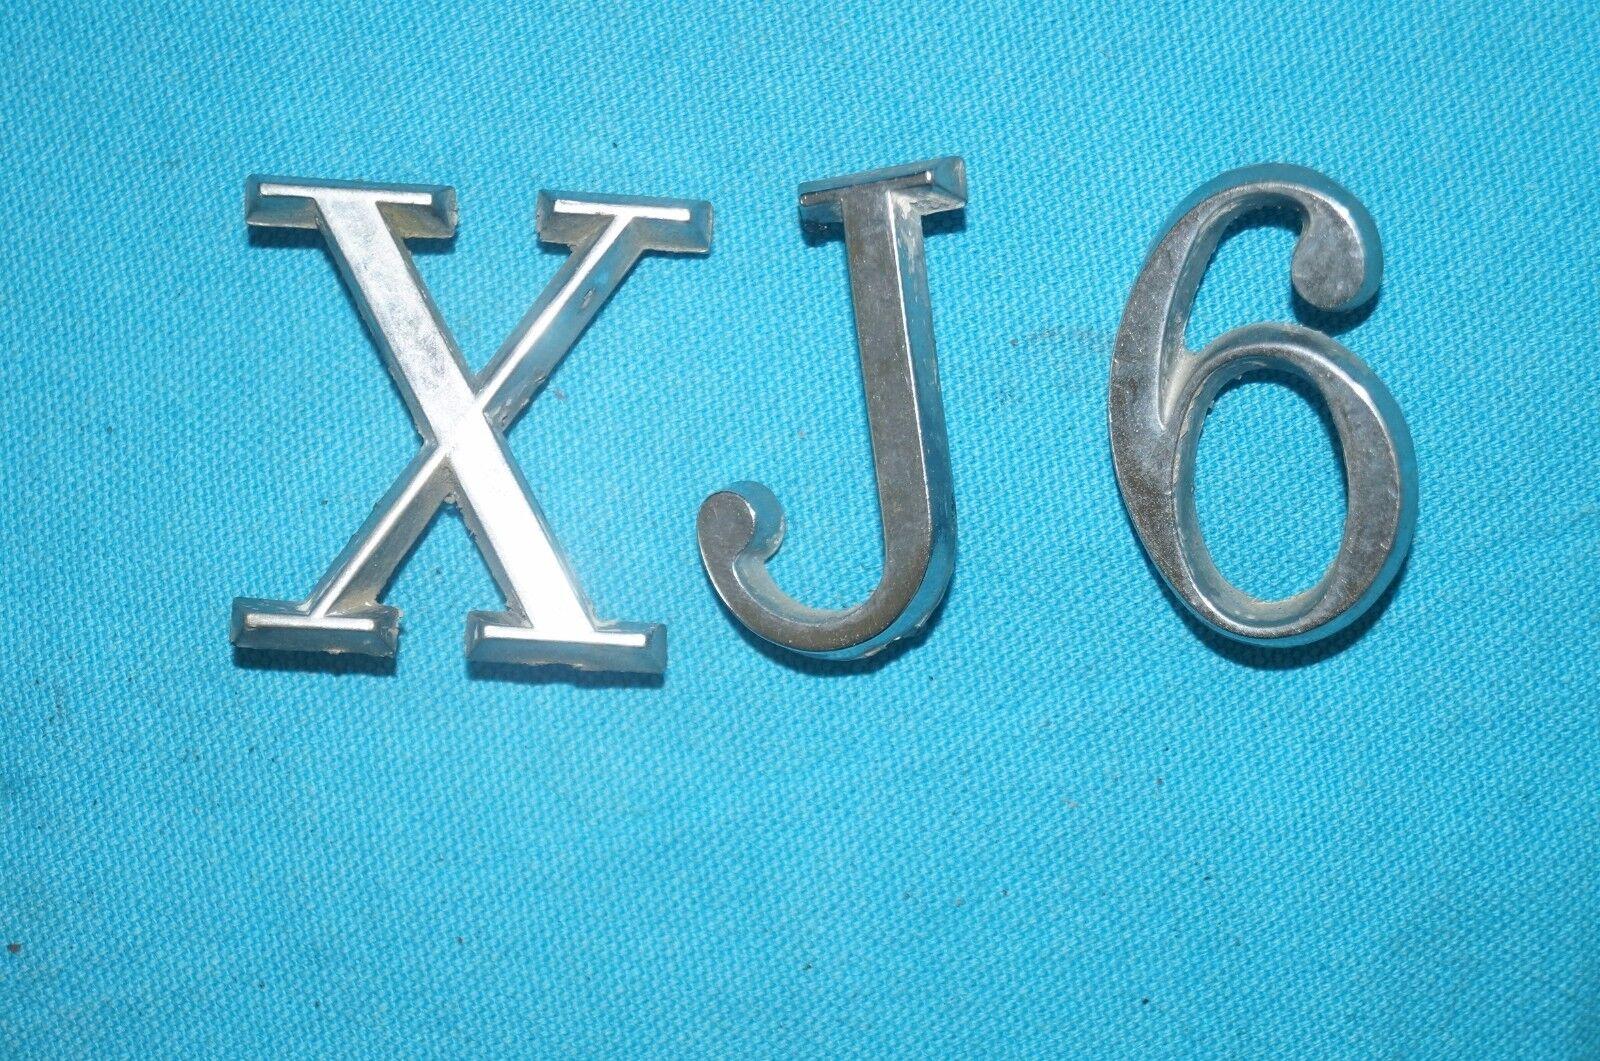 Vintage JAGUAR XJ6 X J 6  Emblem logo decal metal